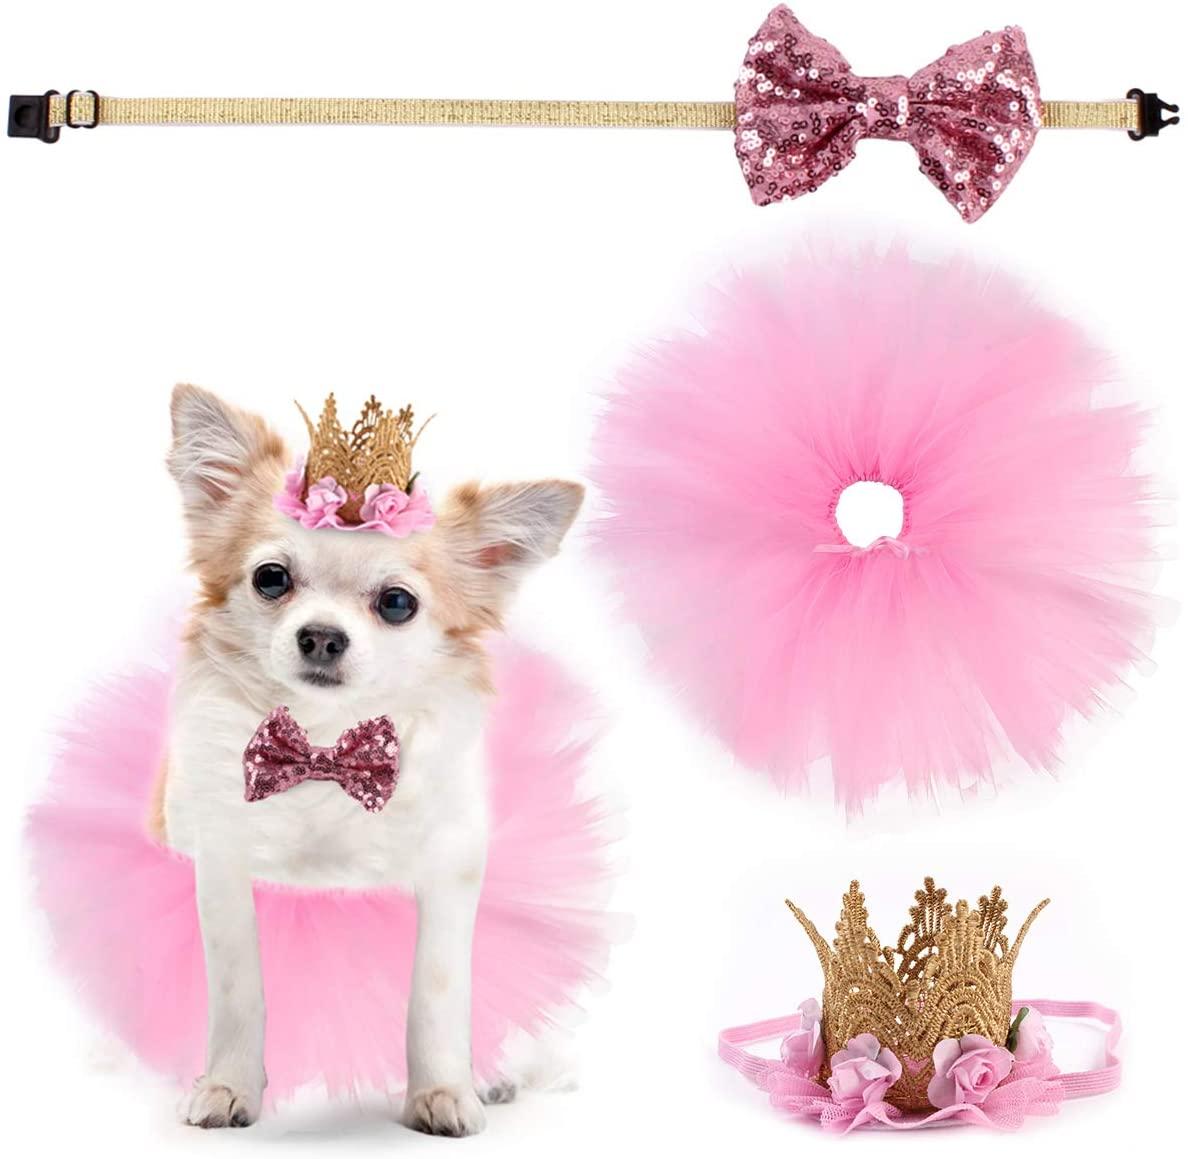 Ayunjia 3pcs/Set Dog Dress Puppy Birthday Party Supplies Tutu Skirt Bowtie Crown Hat Pet Dog Suit for Wedding Dress Valentines Day